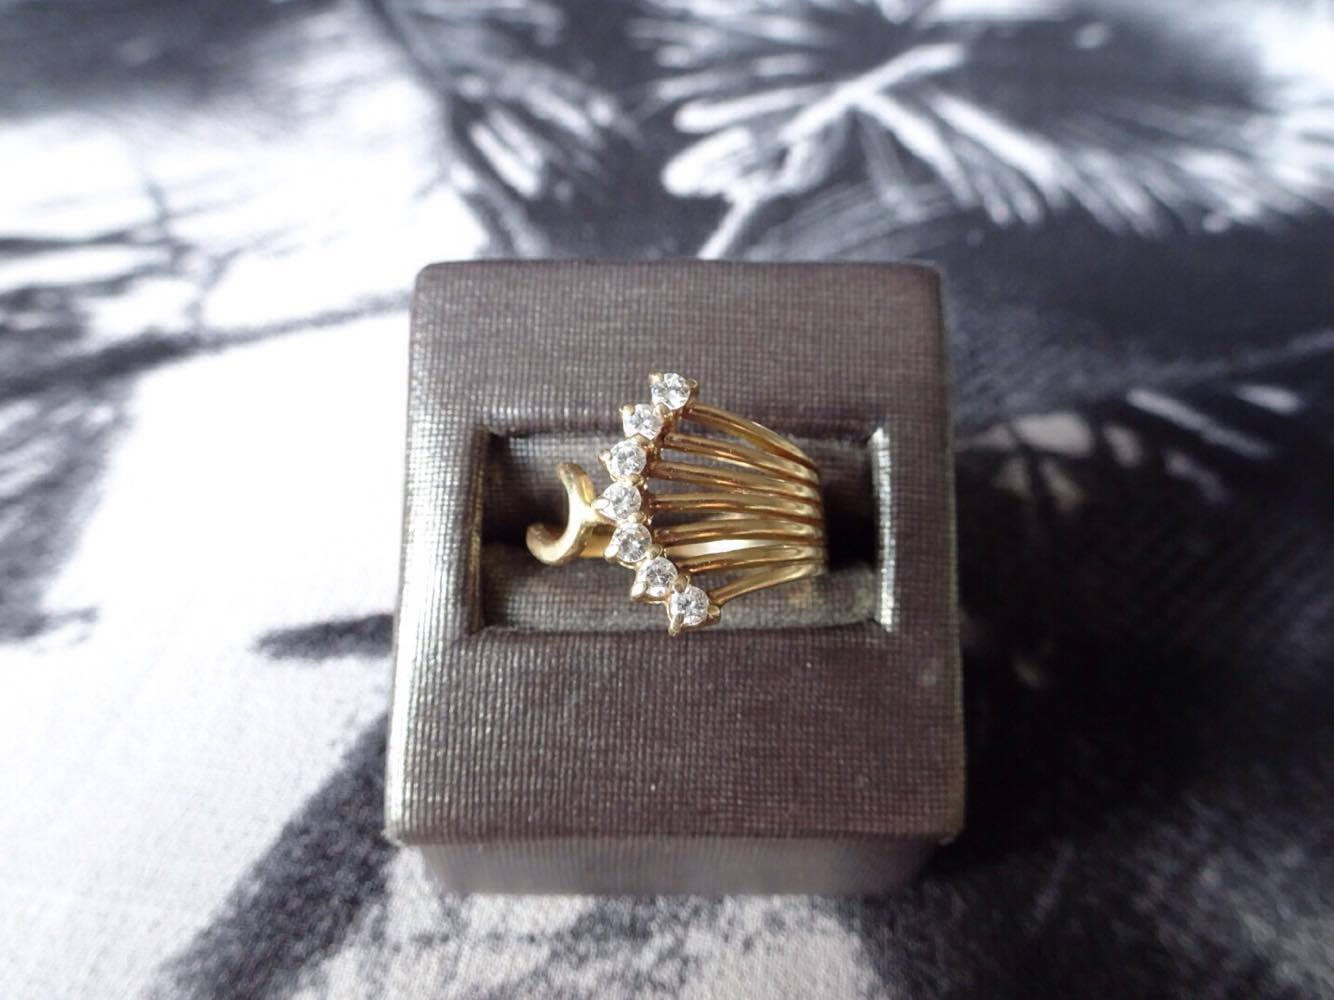 Top view of handmade jewelry